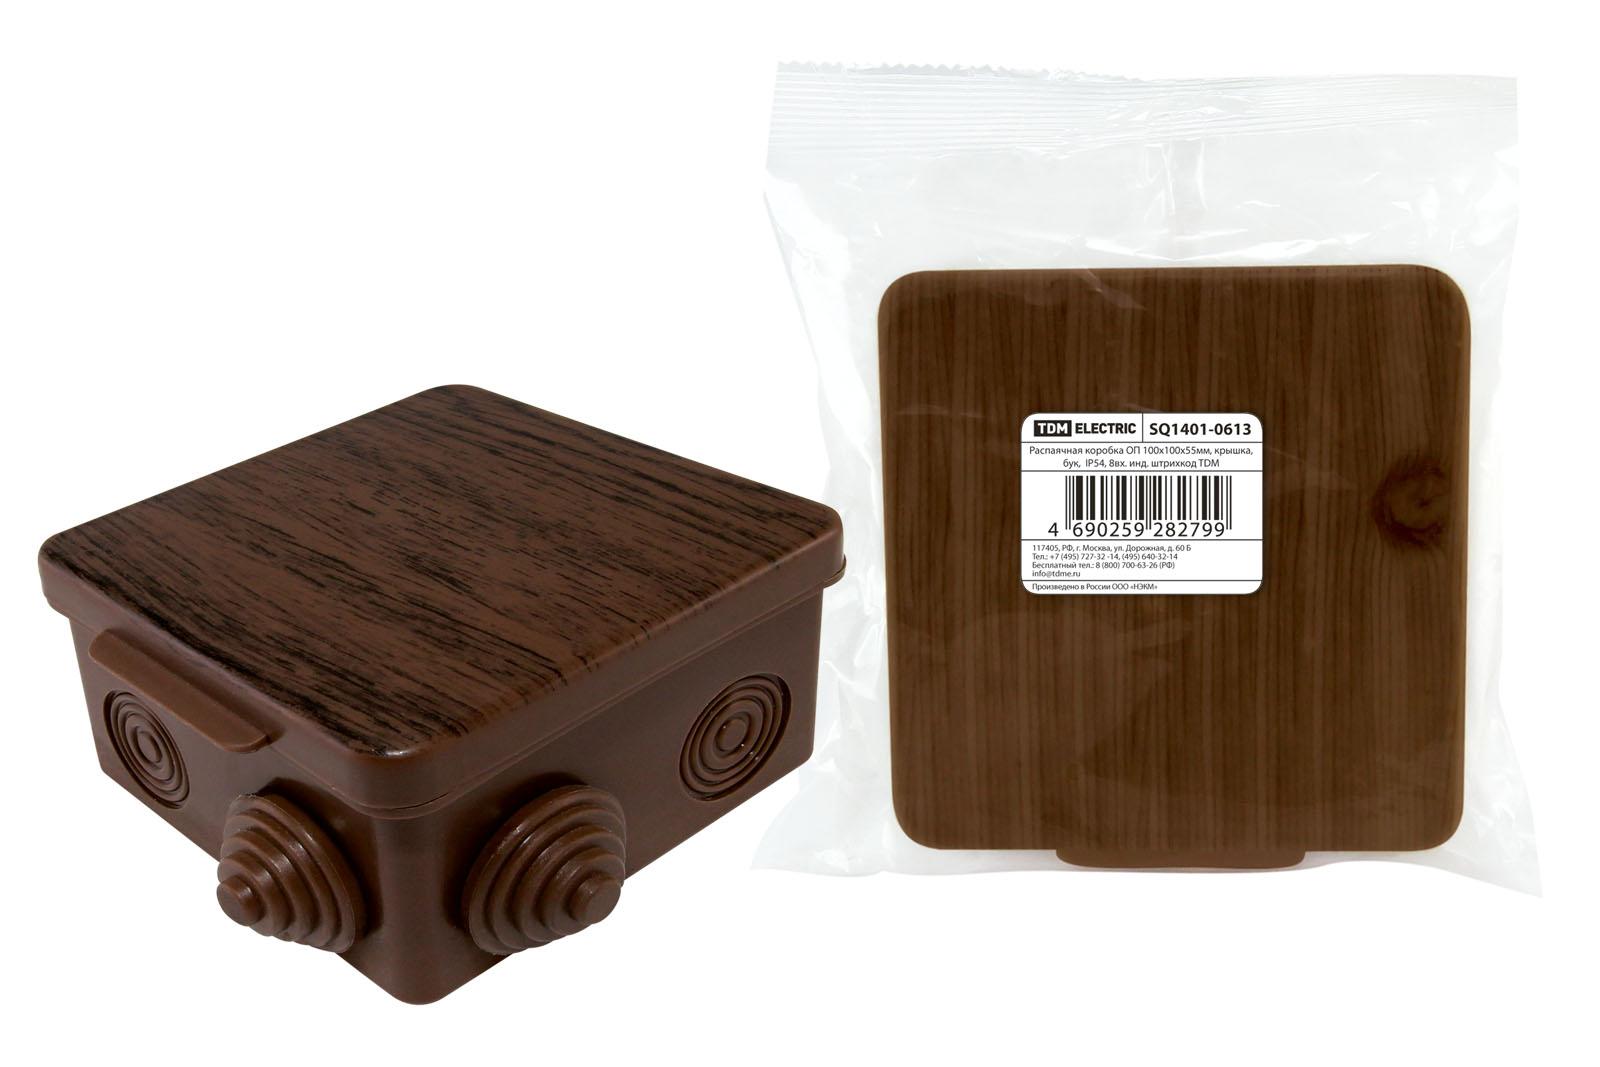 Коробка распаячная Tdm Sq1401-0613 распаячная коробка с крышкой оп 240х195х165мм ip44 кабельные ввода d28 3шт d37 2шт tdm sq1401 1273